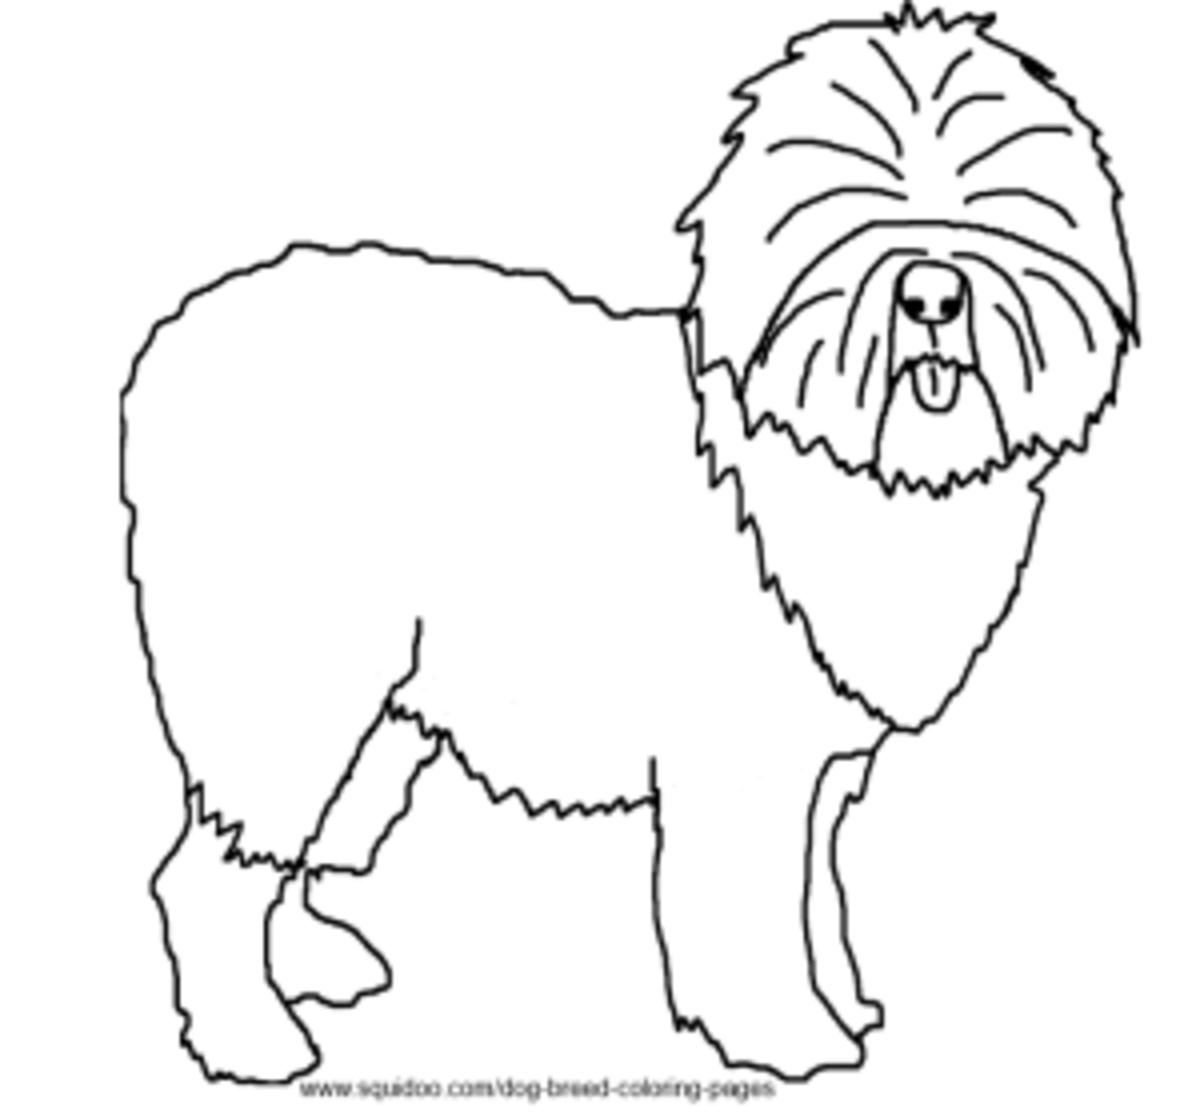 Old English Sheep Dog coloring page